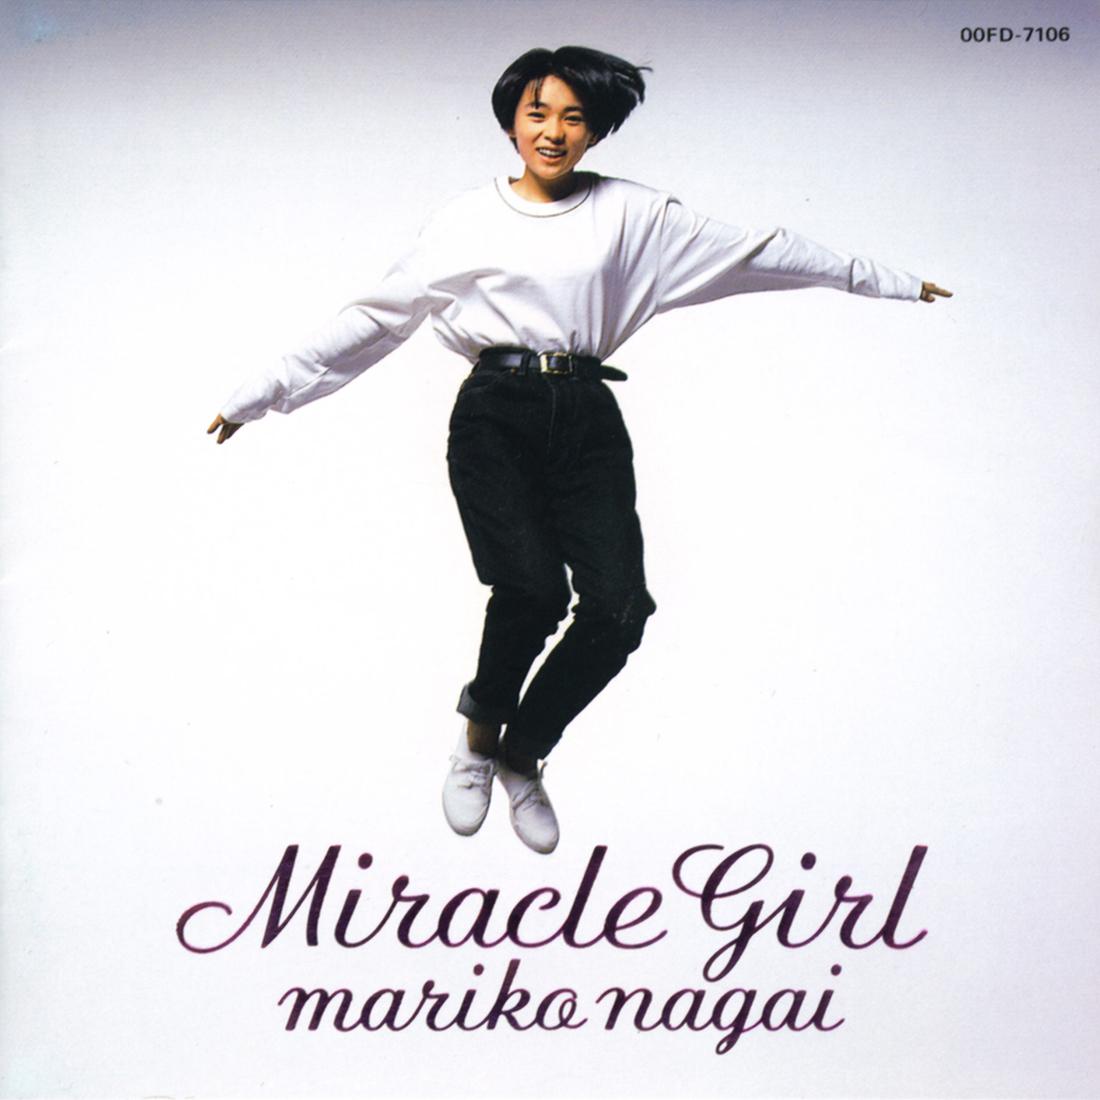 20181004.2156.11 Mariko Nagai - Miracle Girl (1989) (FLAC) cover.jpg